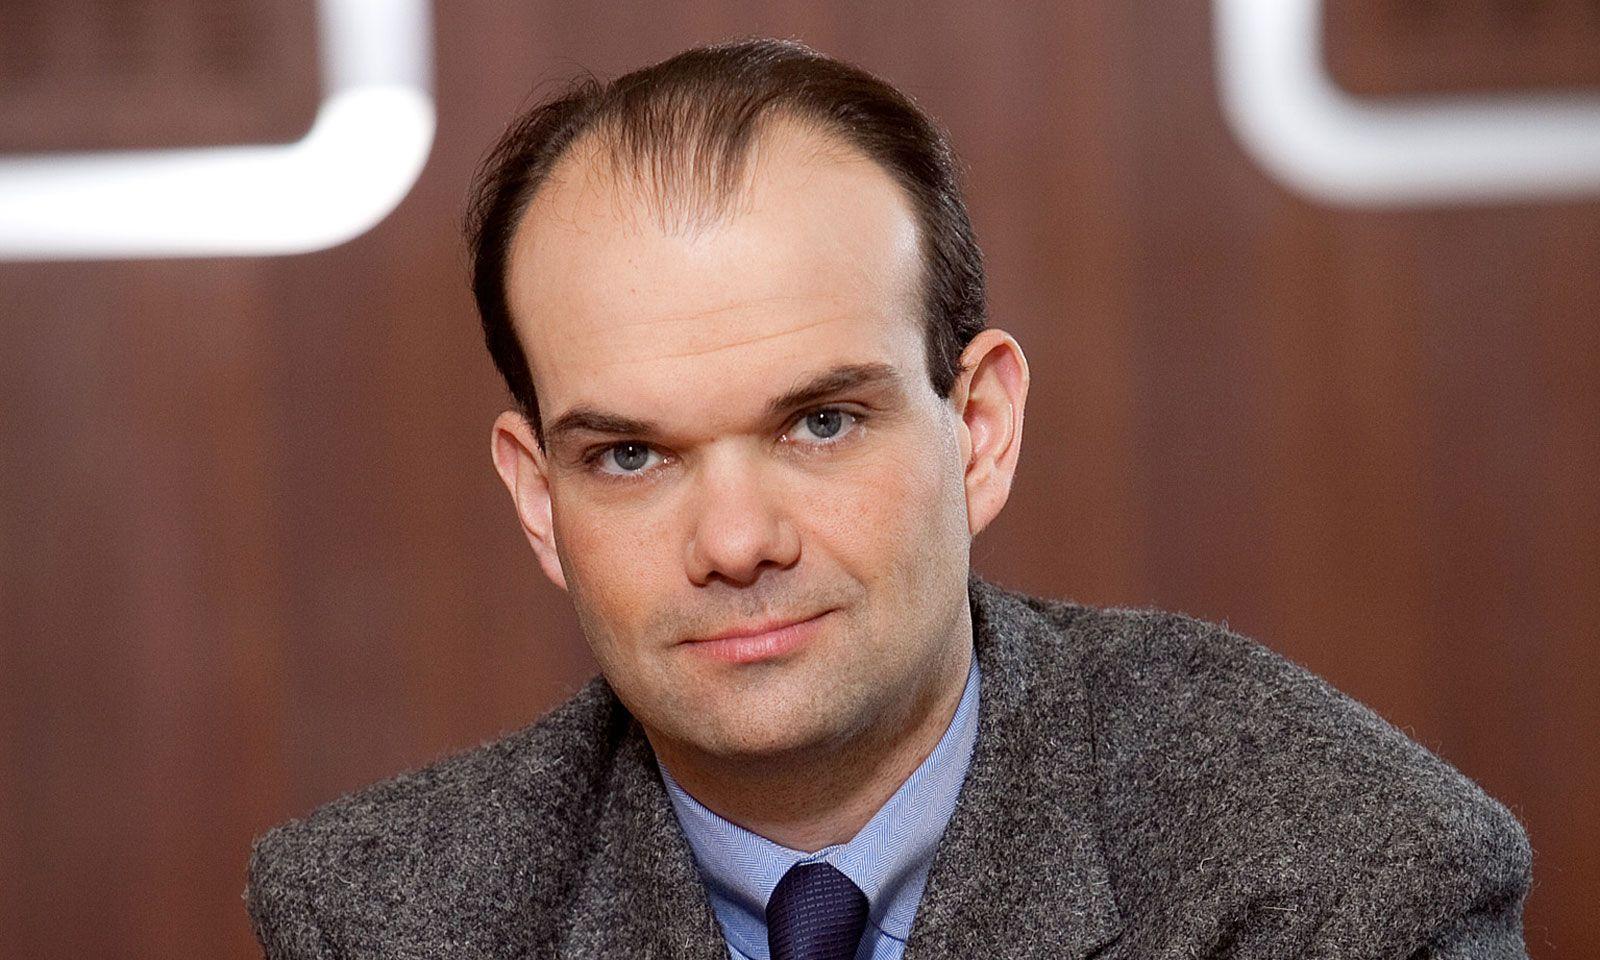 Michael Böheim